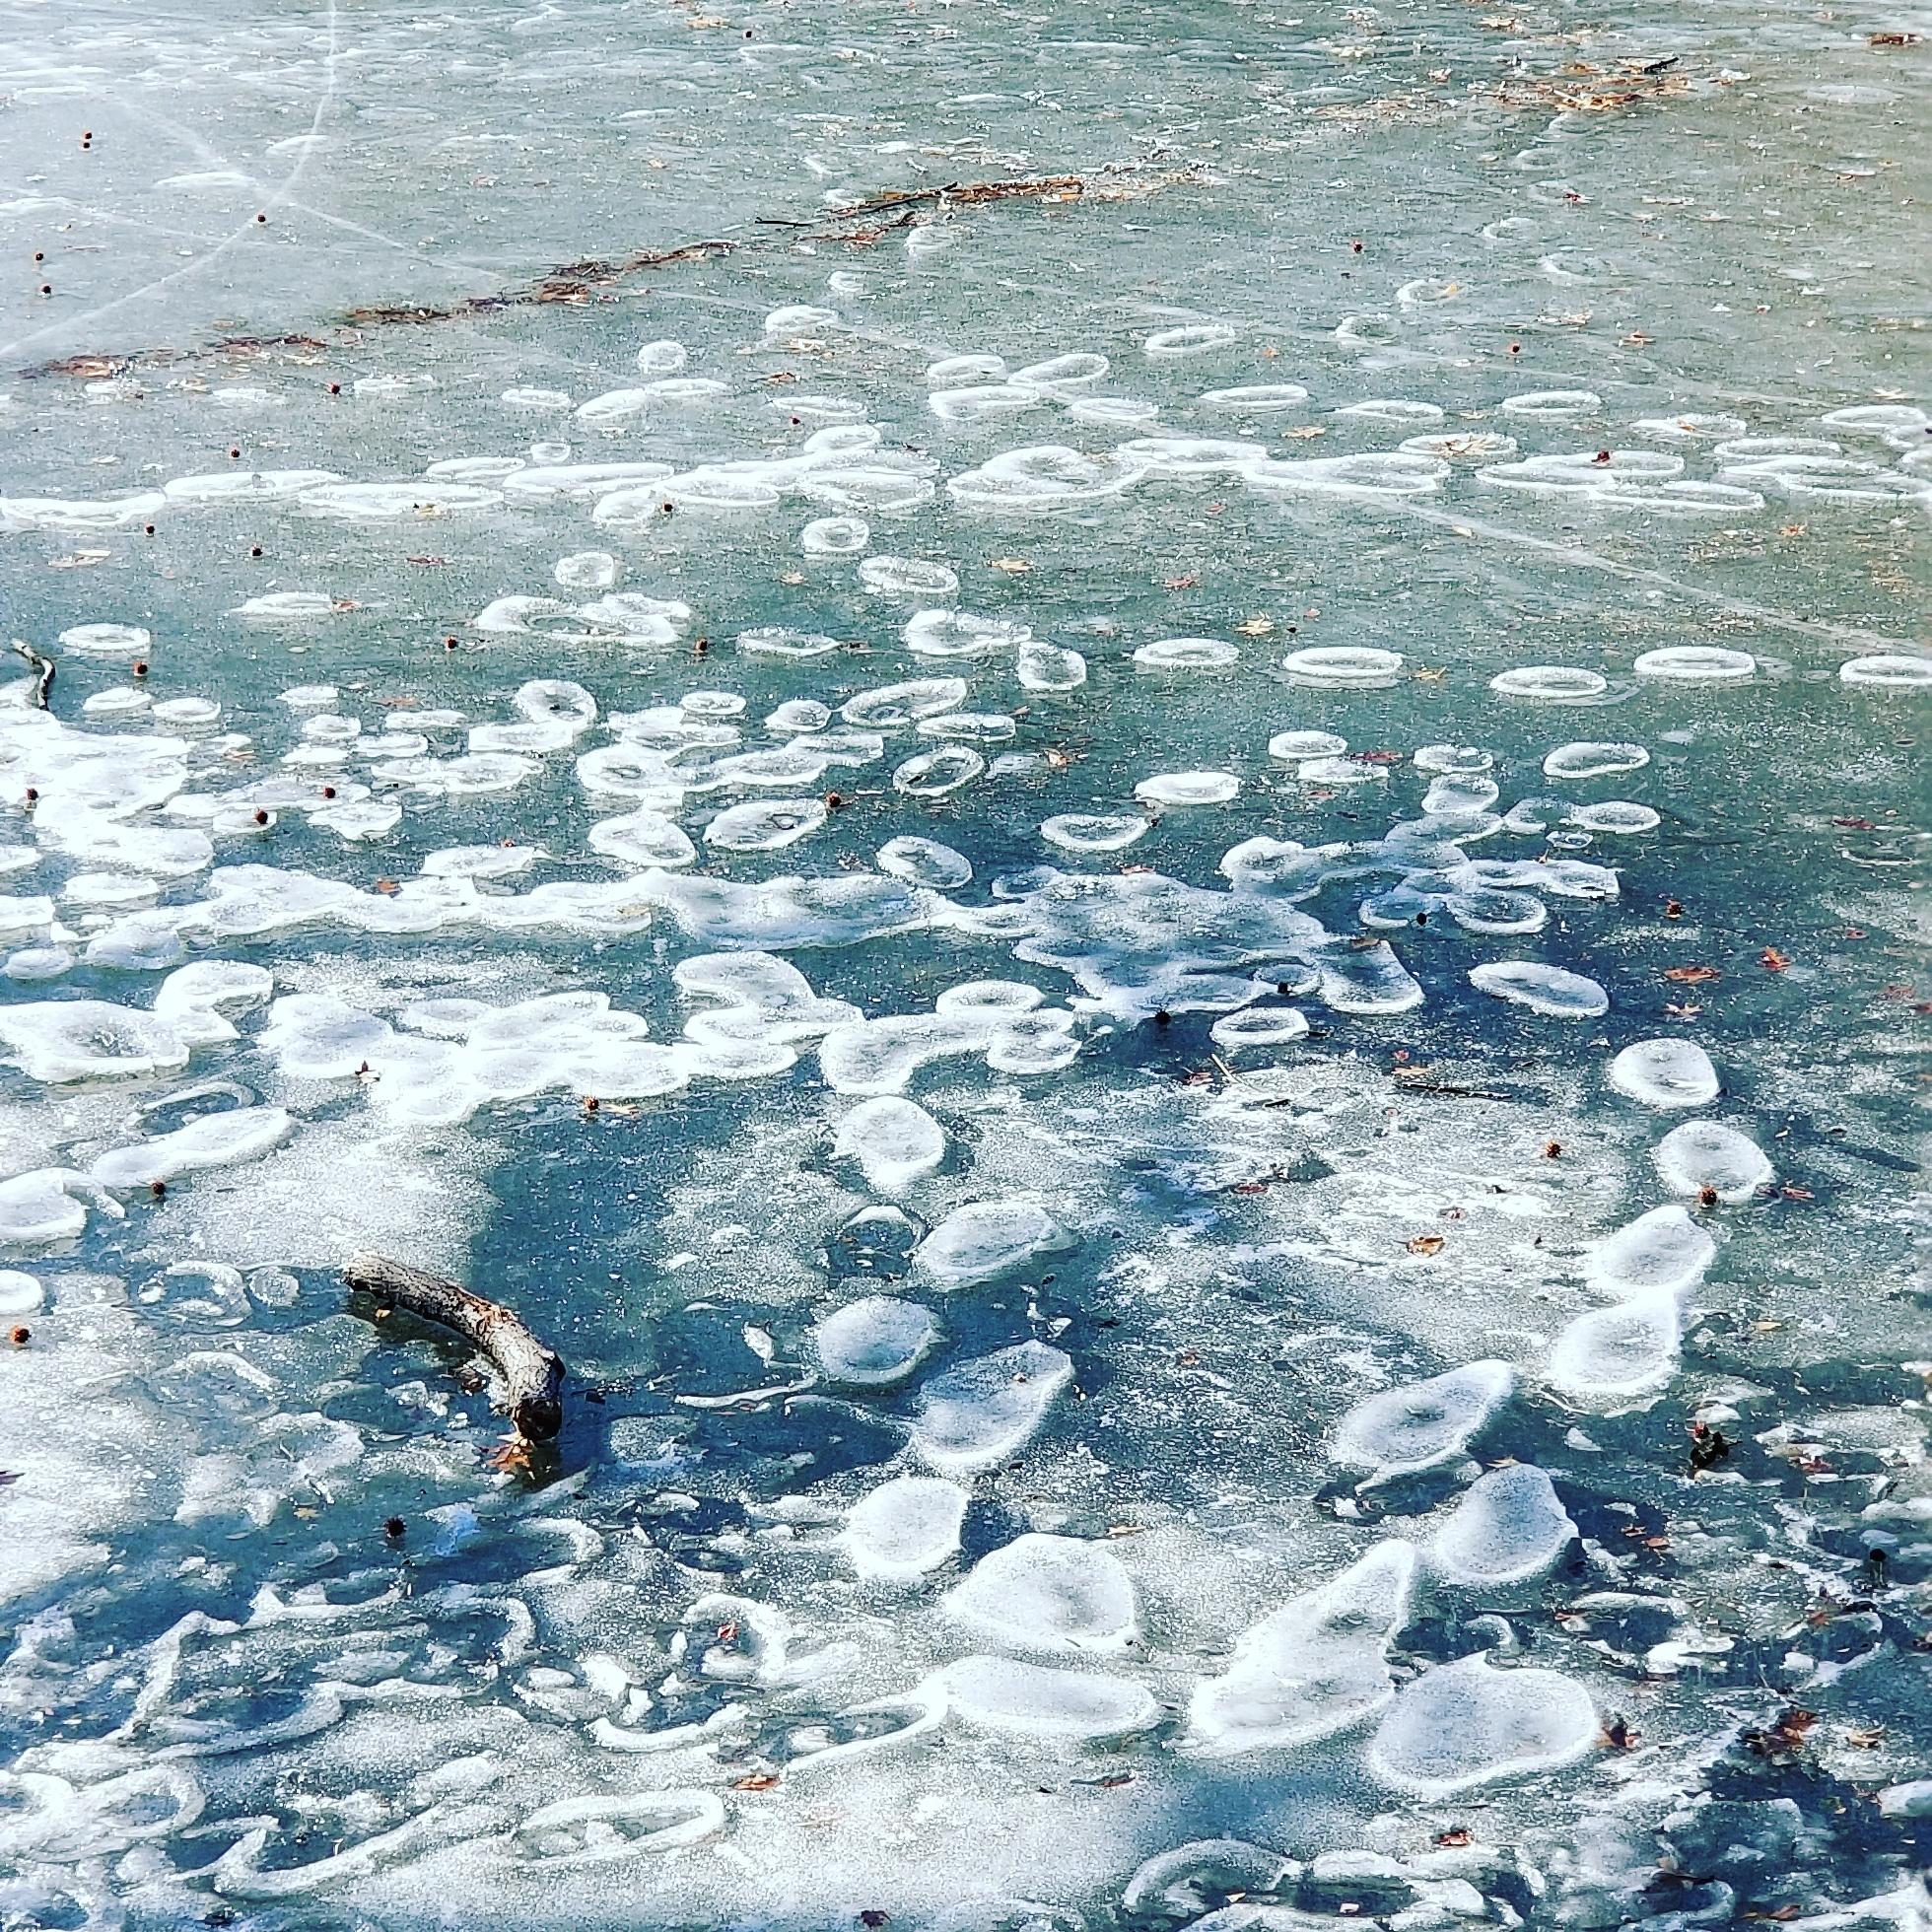 Footsteps on melting ice : pics